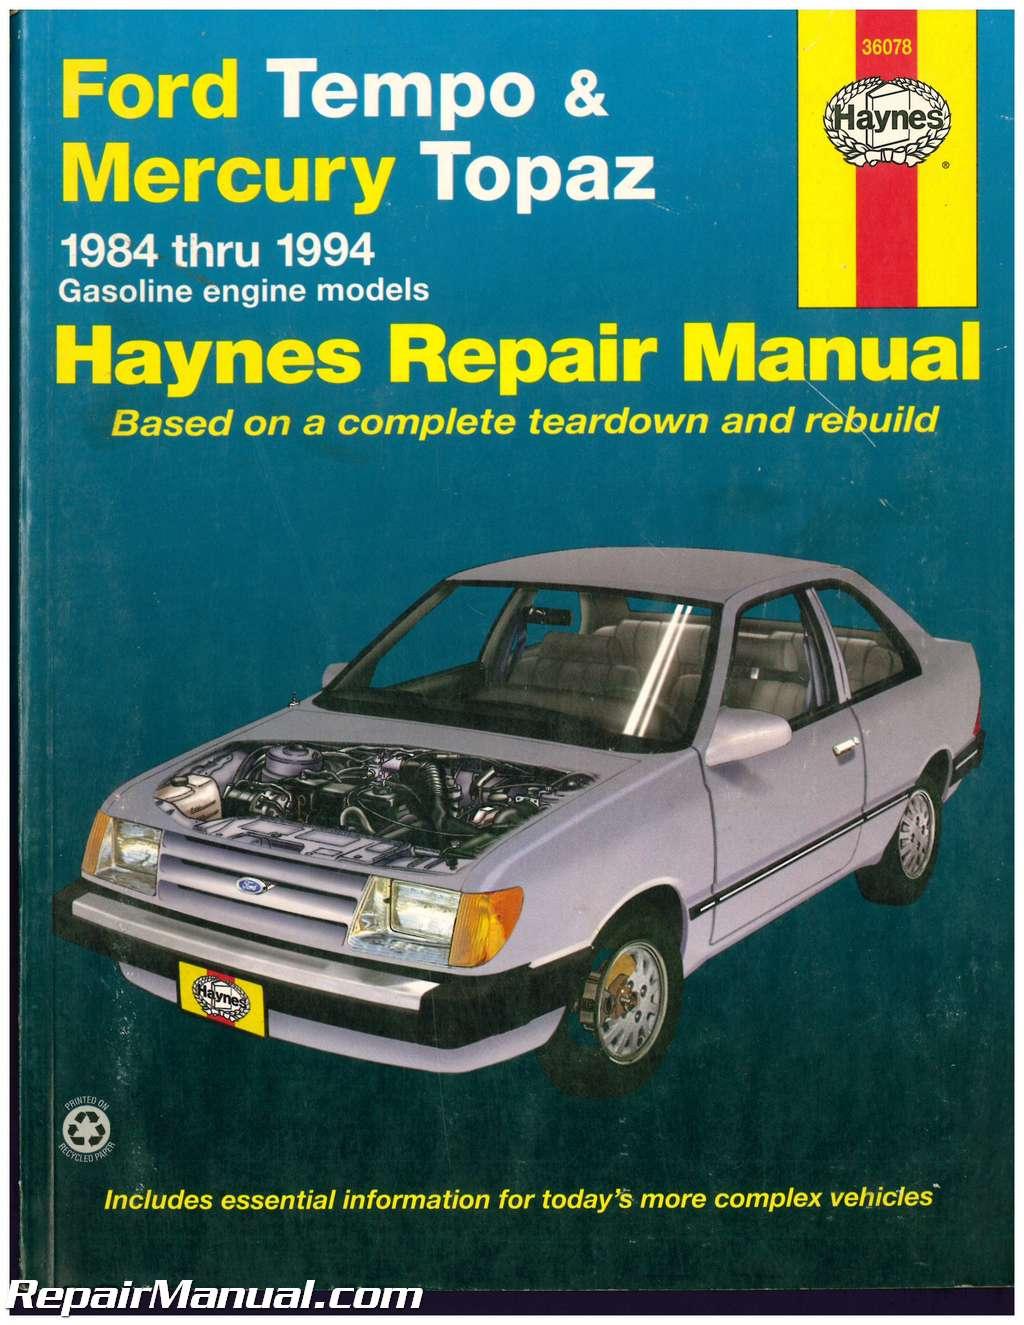 used haynes ford tempo mercury topaz 1984 1994 auto repair manual rh repairmanual com 93 ford tempo service manual Vehicle Owner's Manual